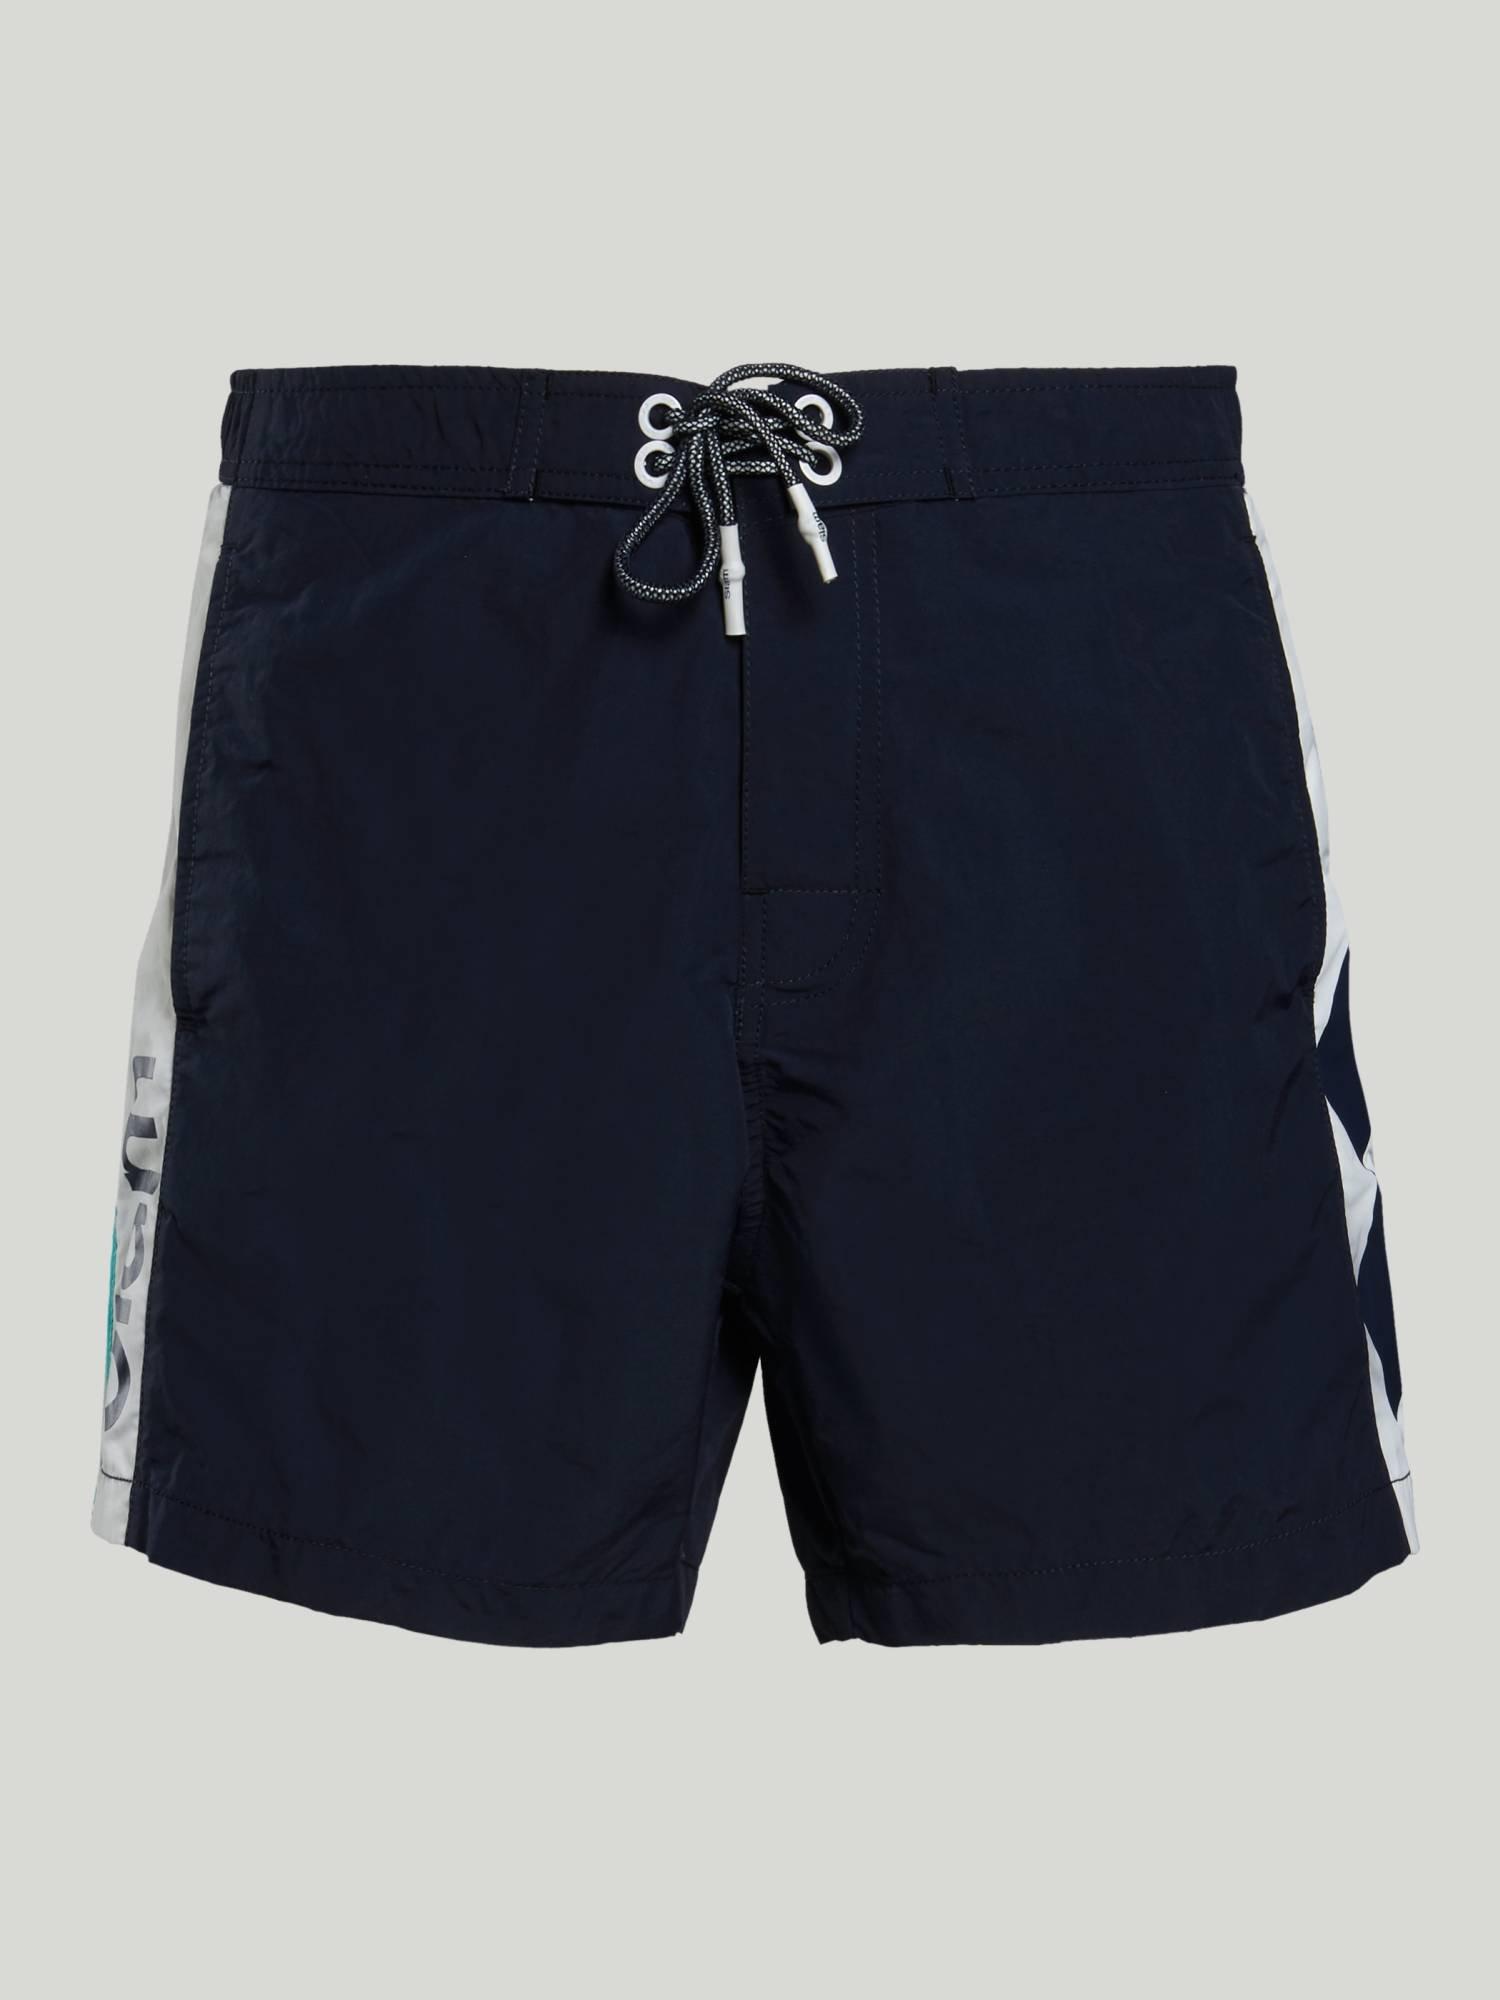 Swimsuit A60 - Marinenblau